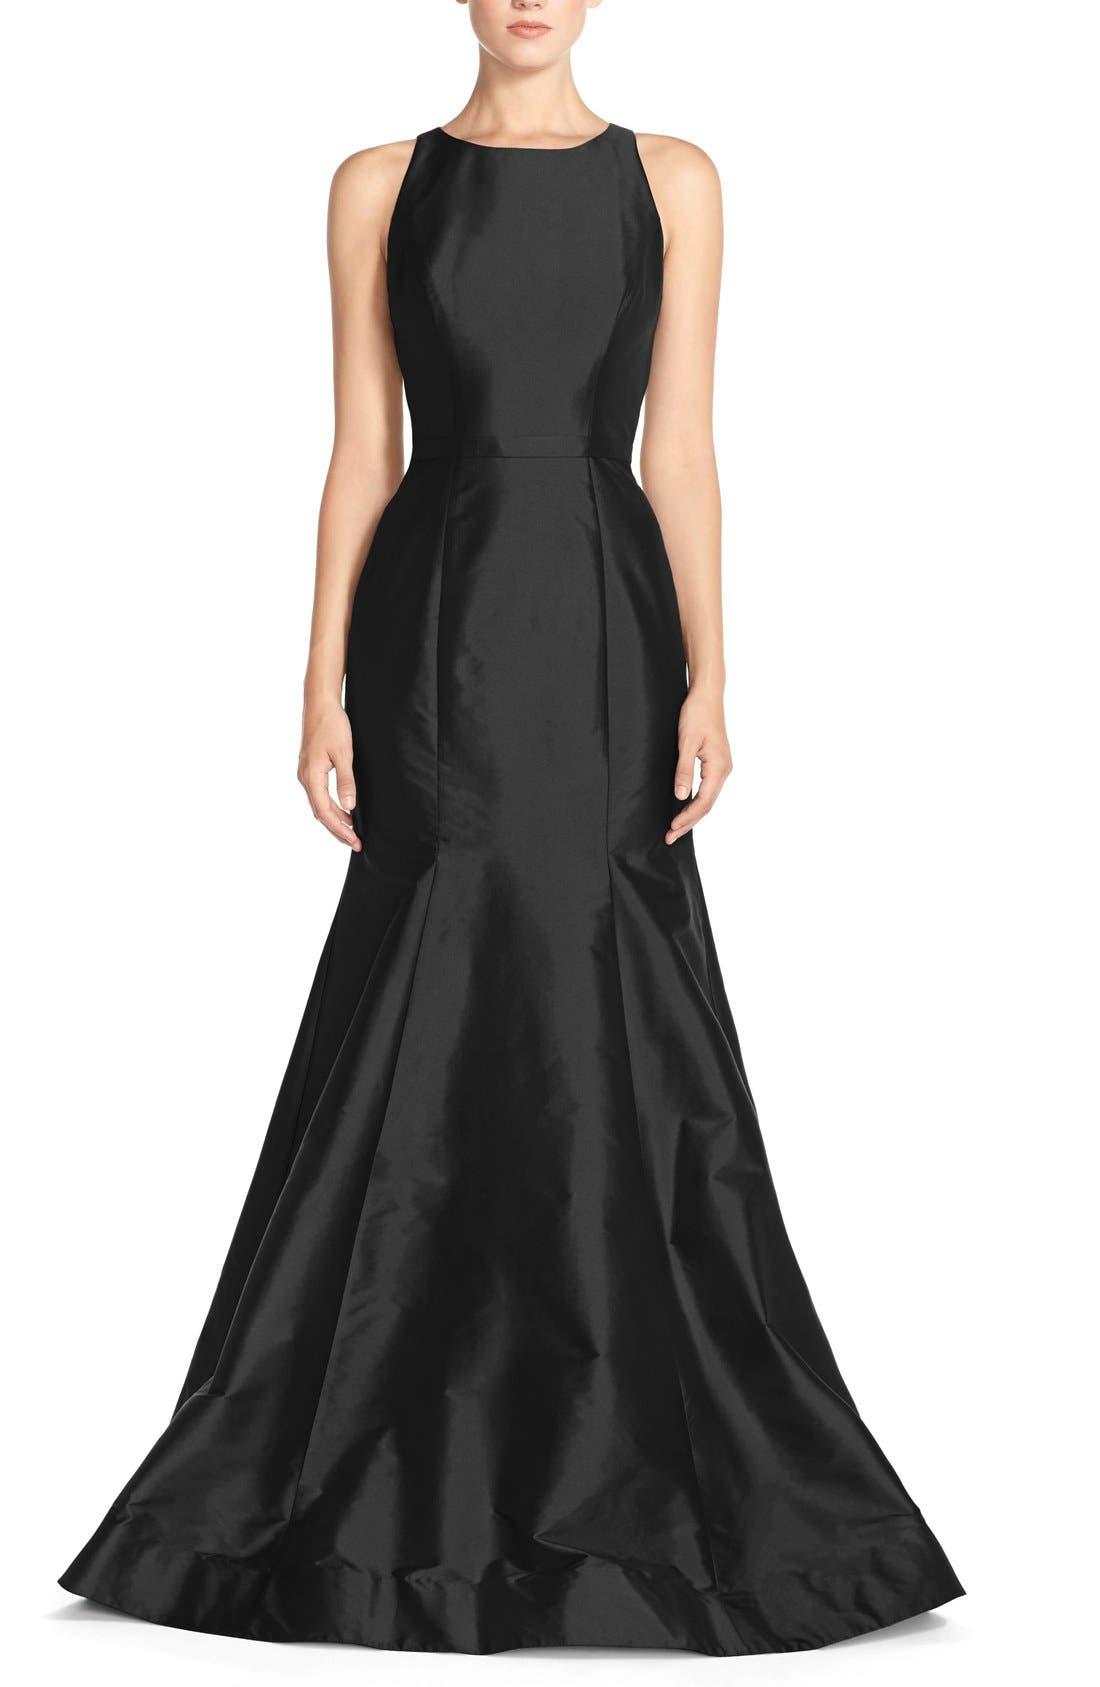 Monique Lhuillier Bridesmaids Back Cutout Taffeta Mermaid Gown